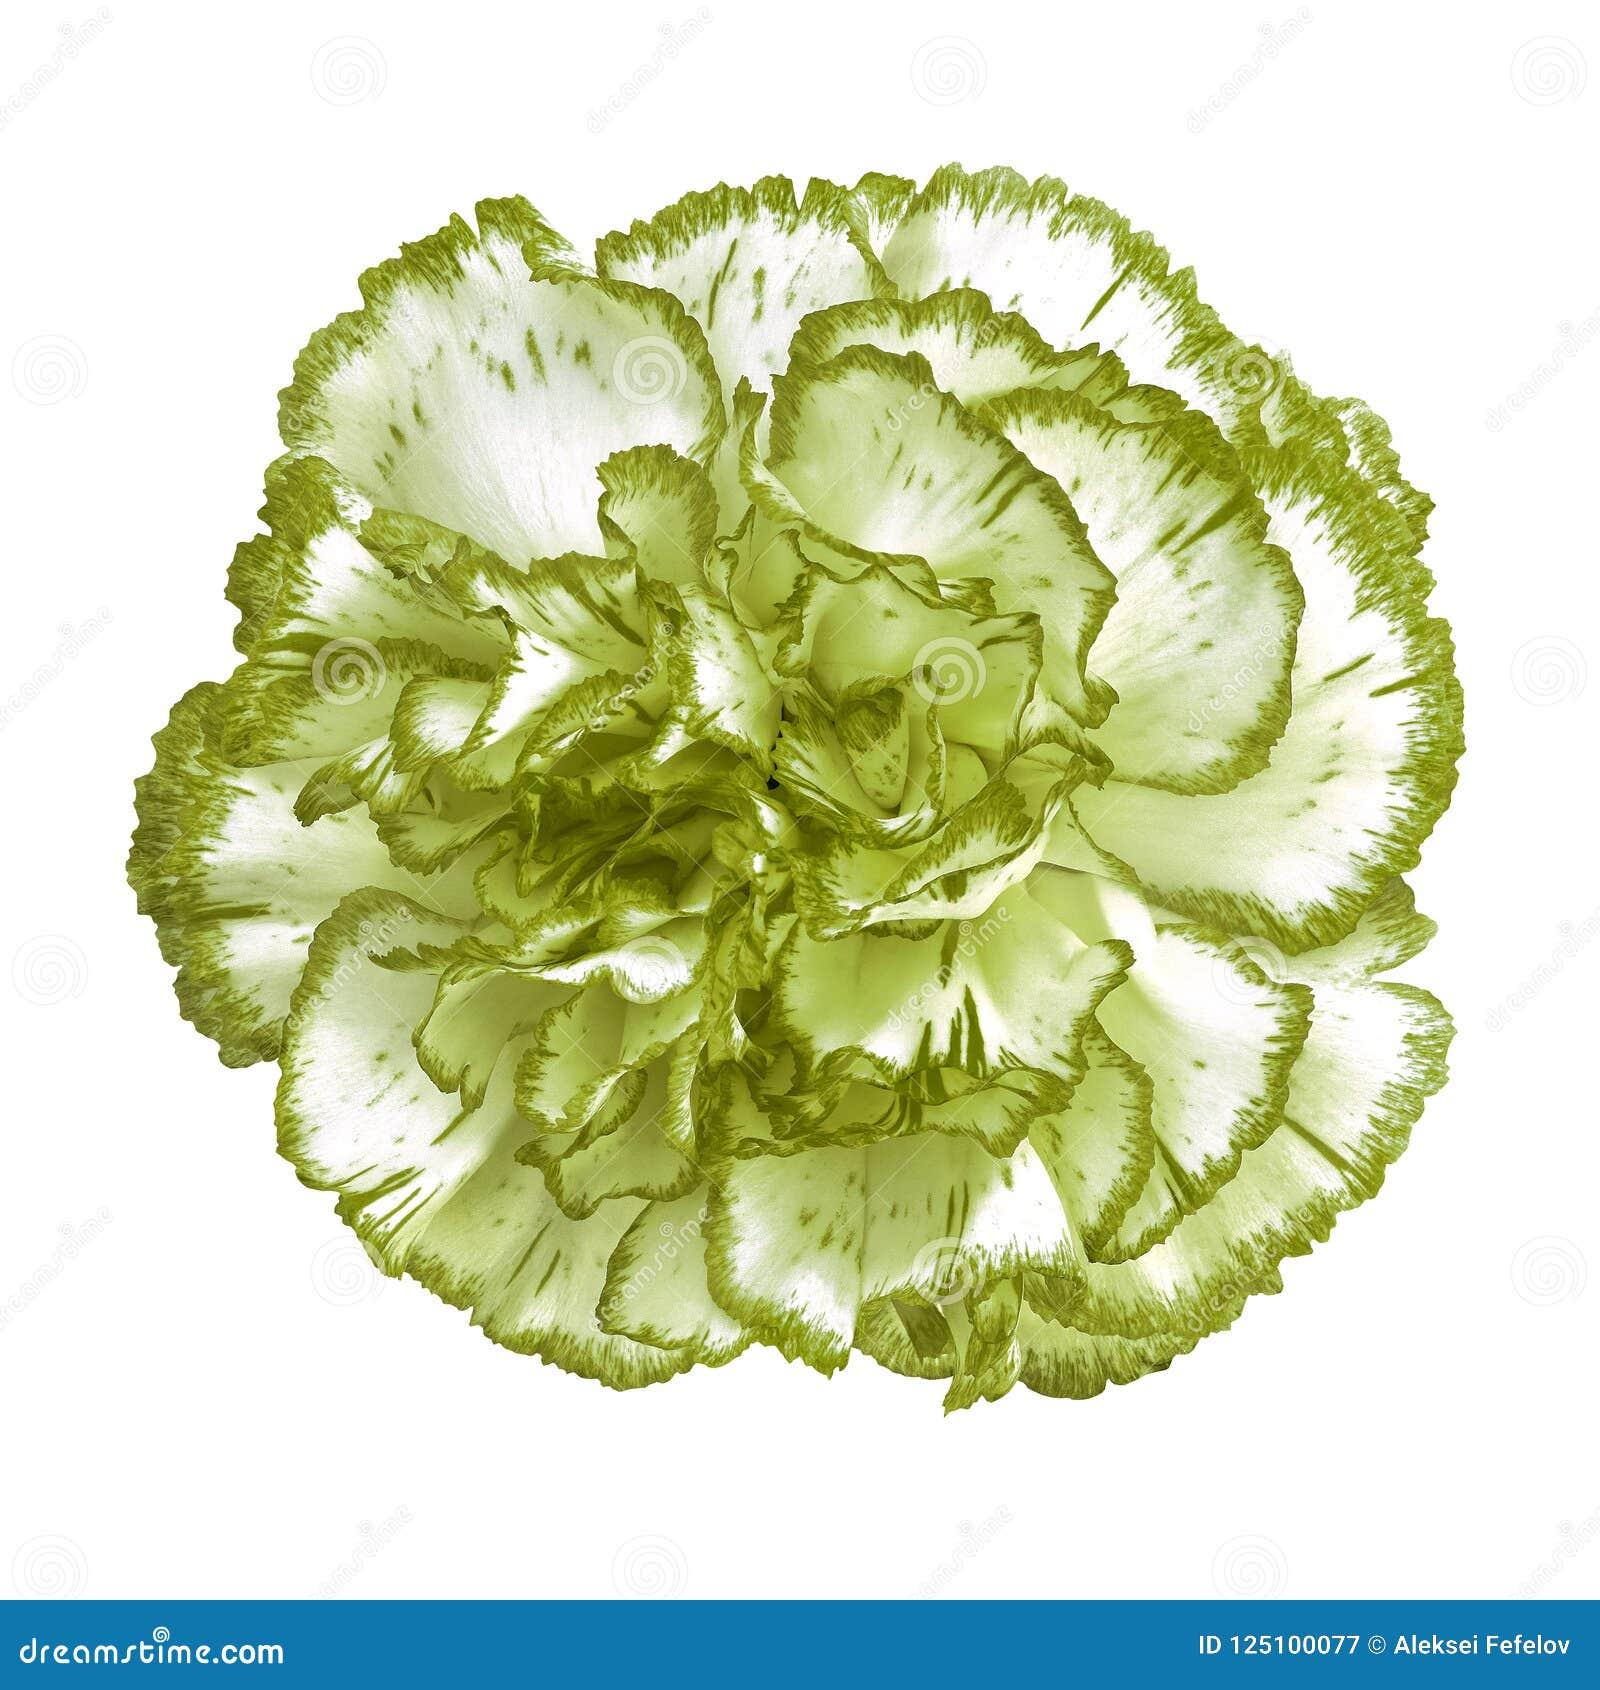 Asparagus Green White Carnation Flower Isolated On White Background